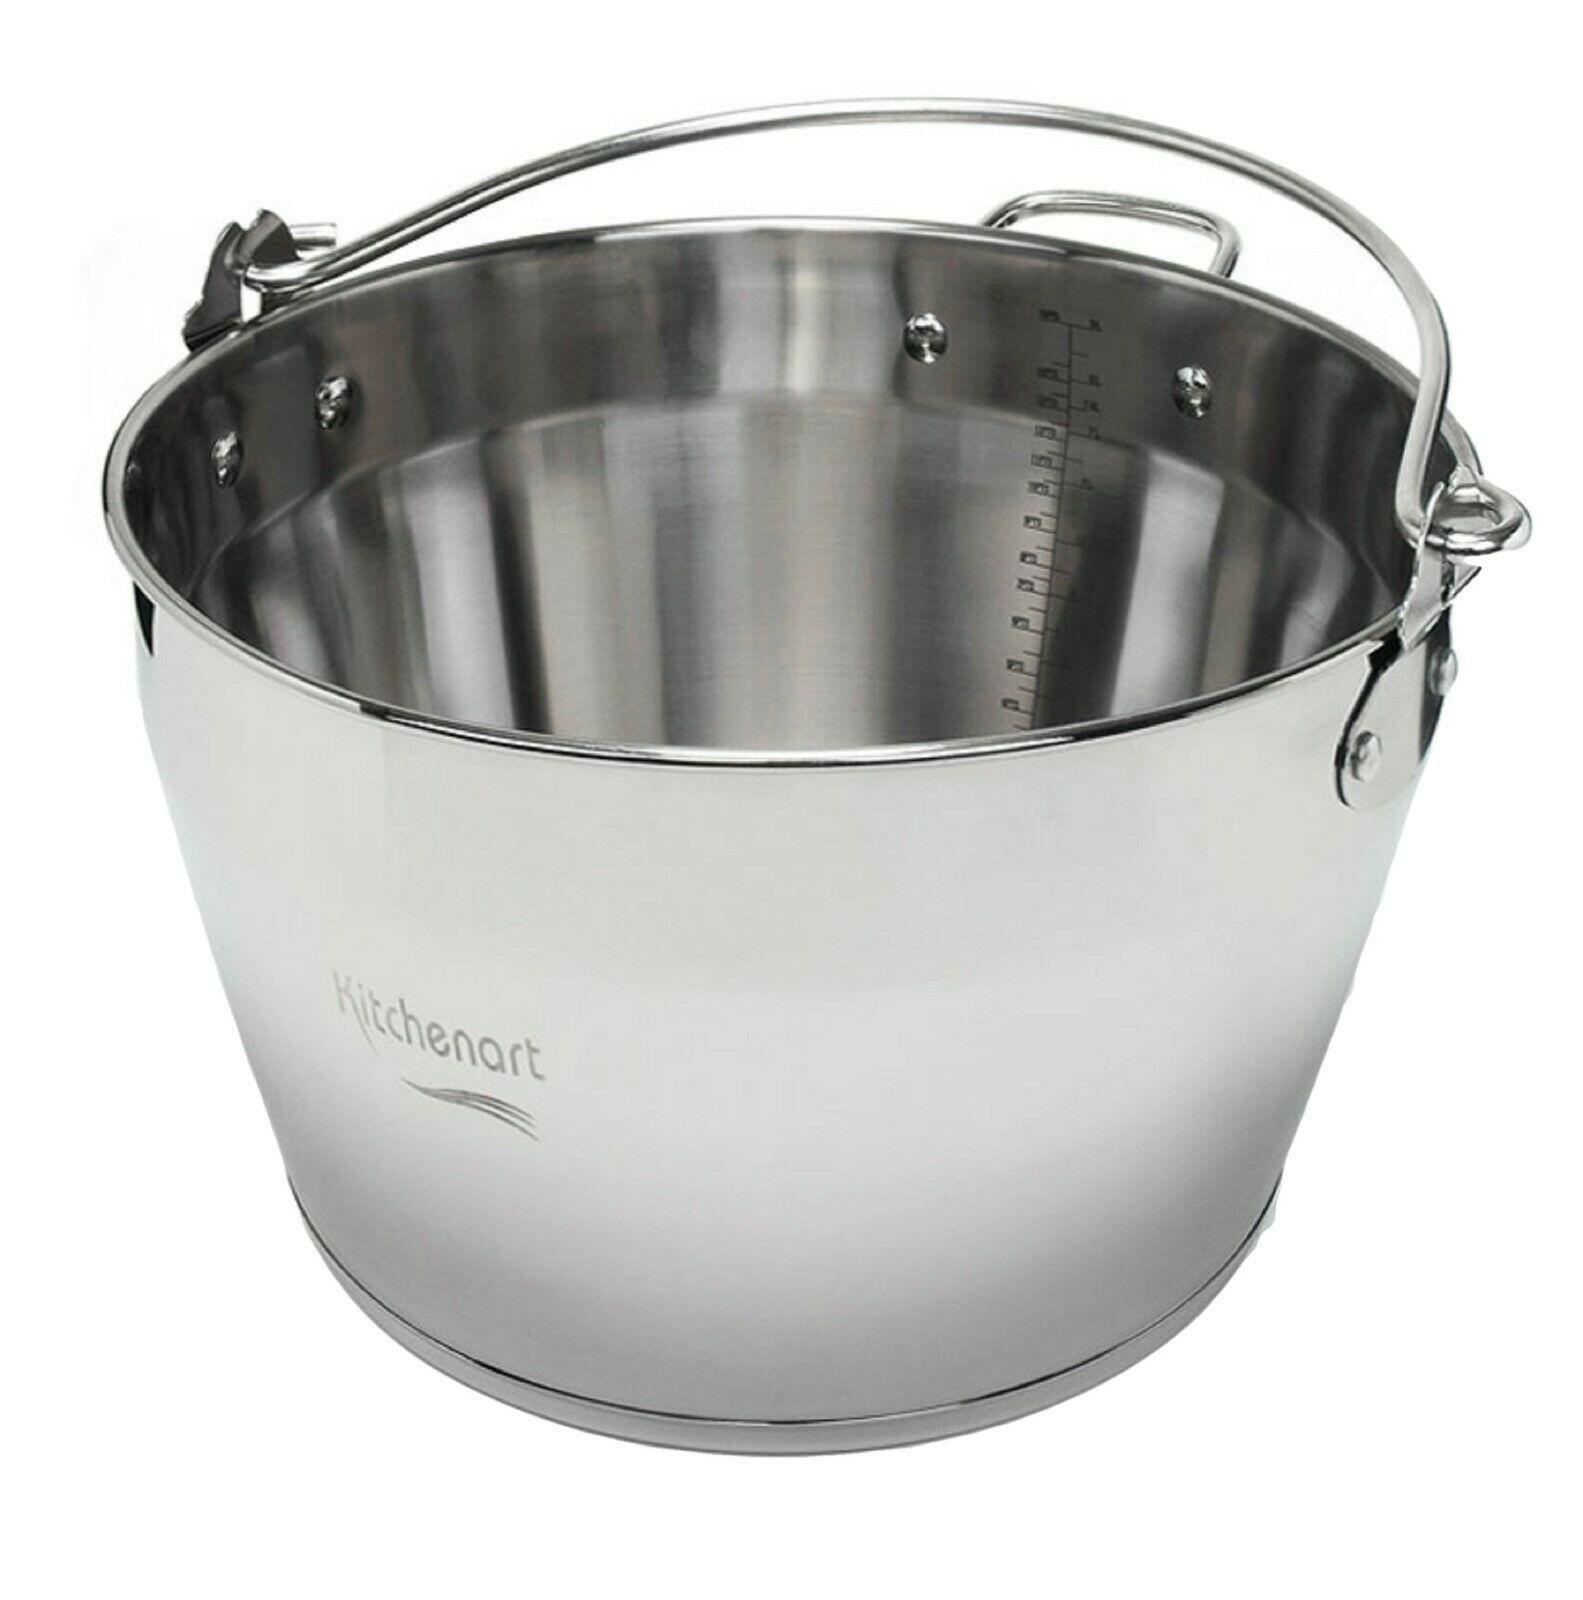 KichenArt Stainless Steel Induction Jam Pot Bucket Multipot Basket 9L (No Lid)